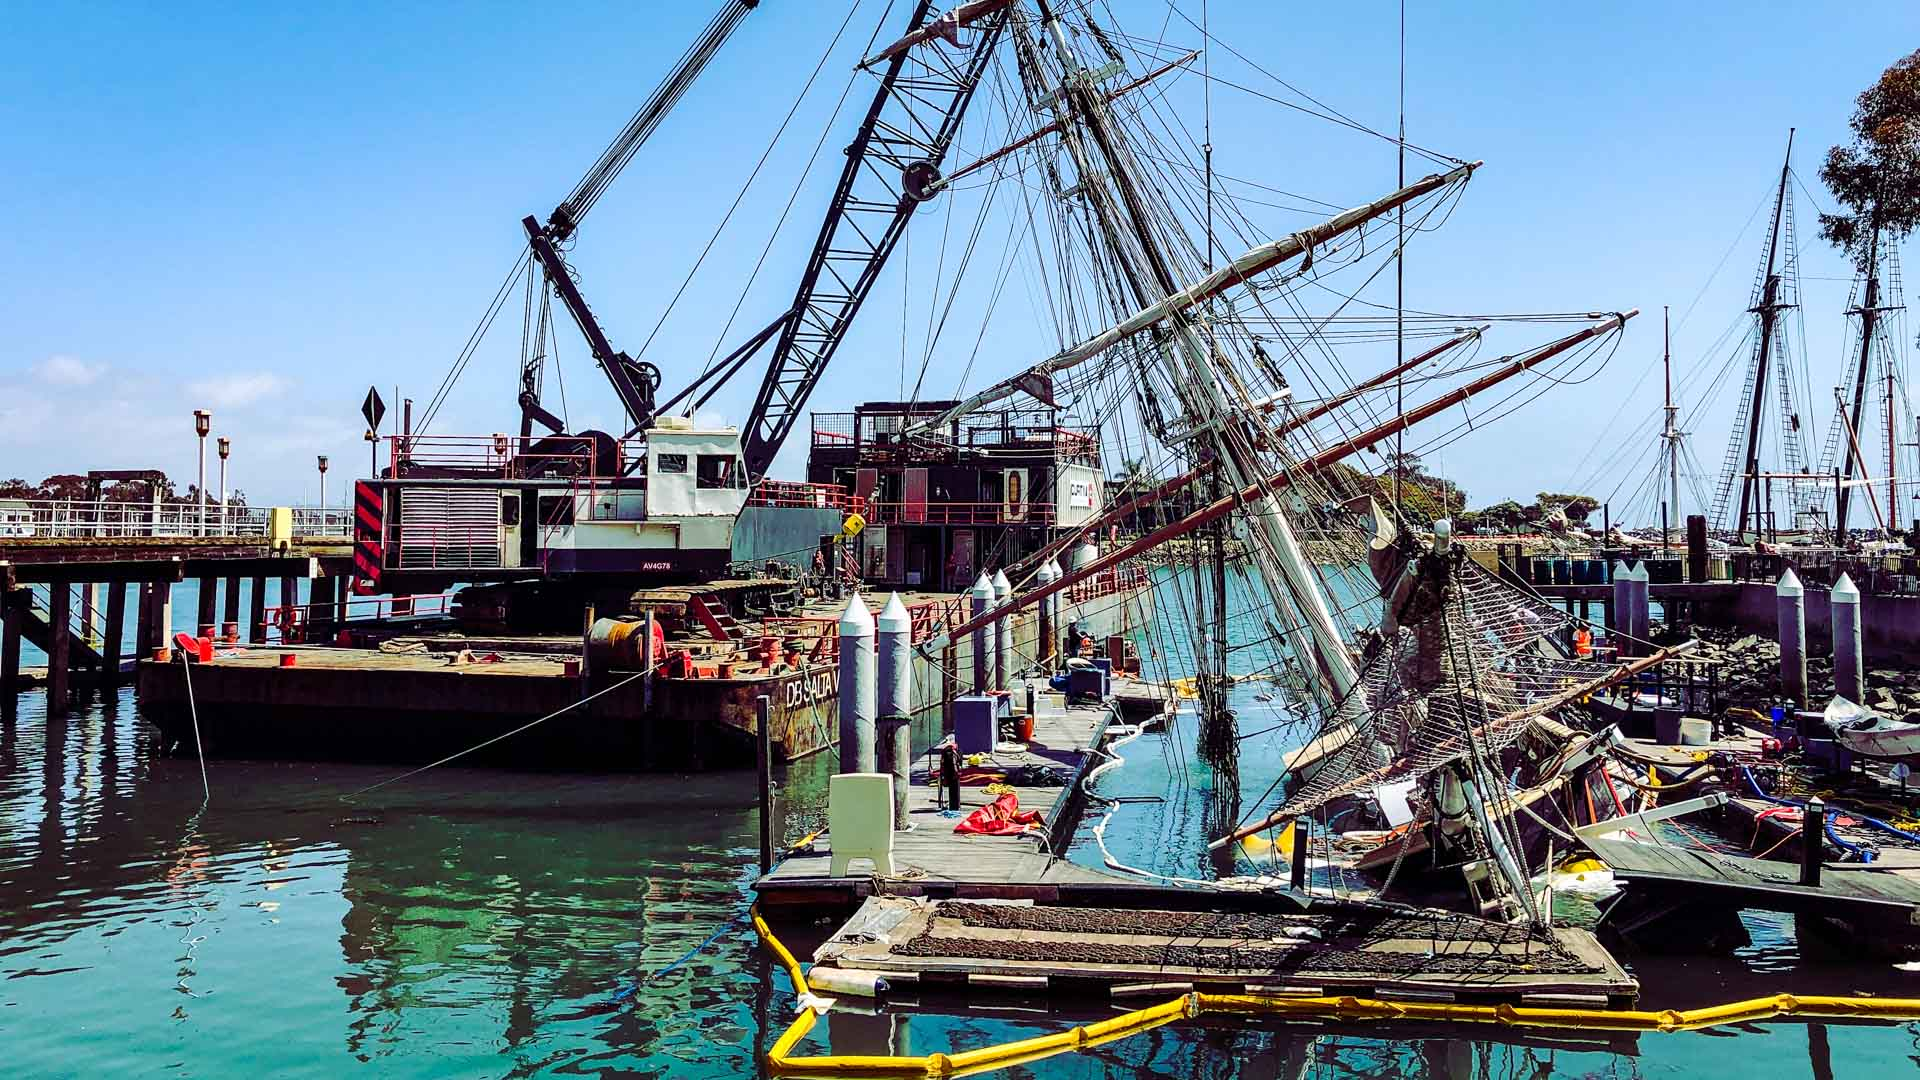 Pilgrim Tall Ship Salvage Vessel Demolition